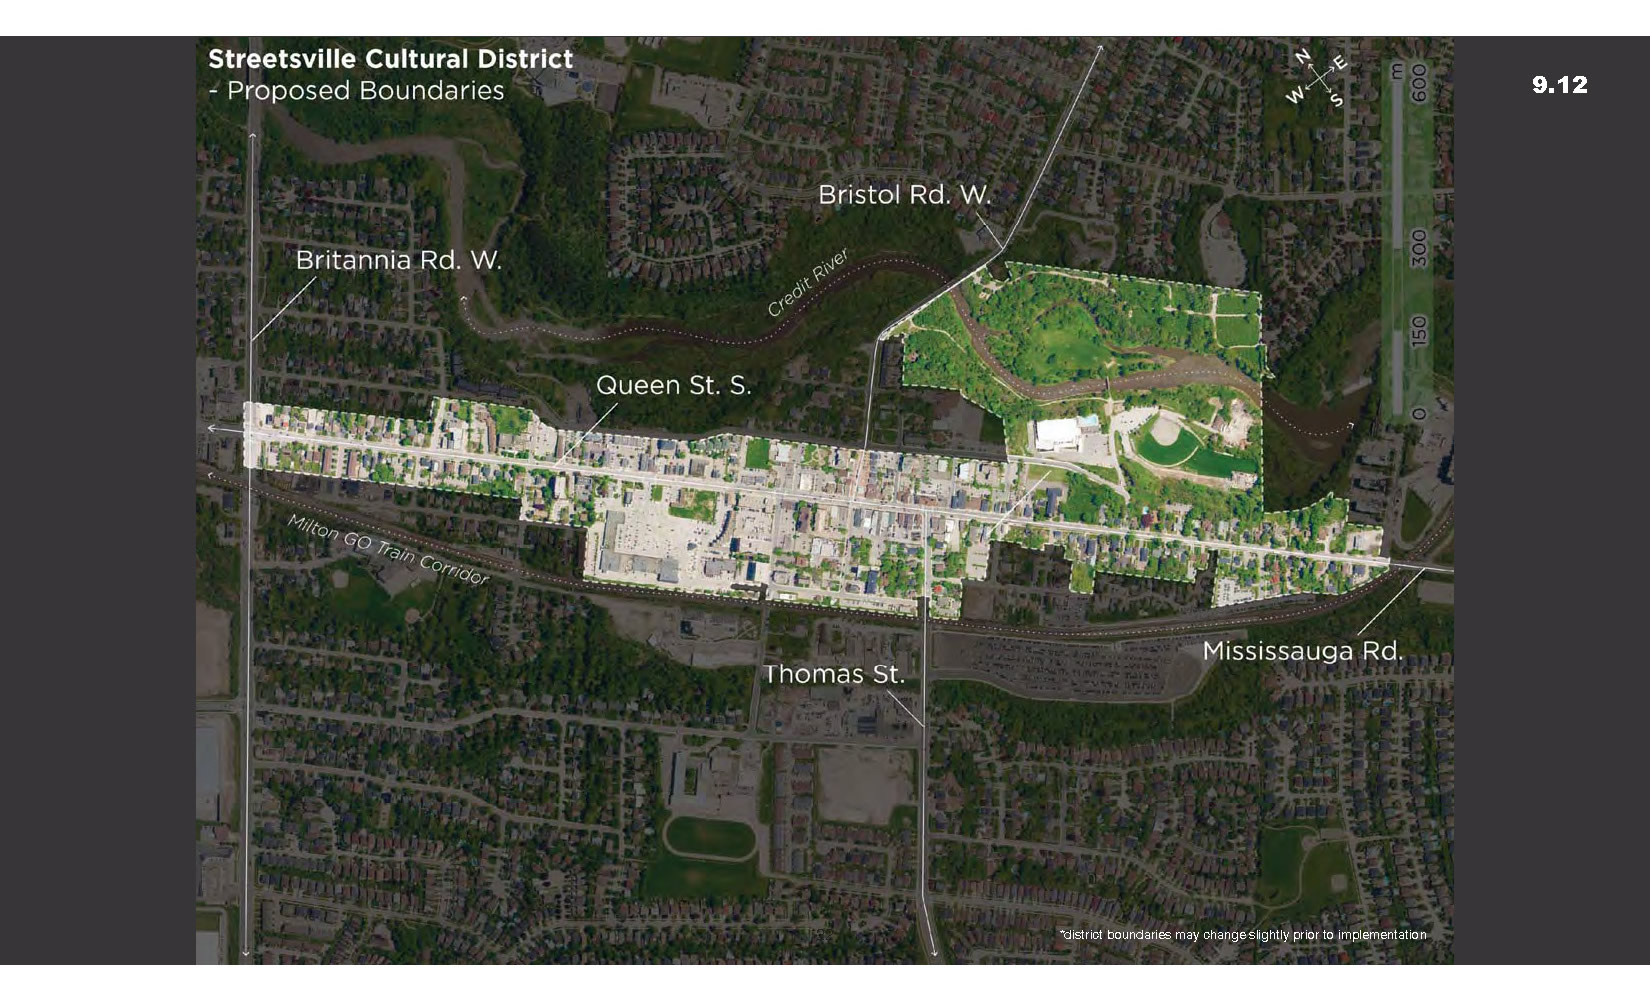 Proposed Streetsville District Boundaries